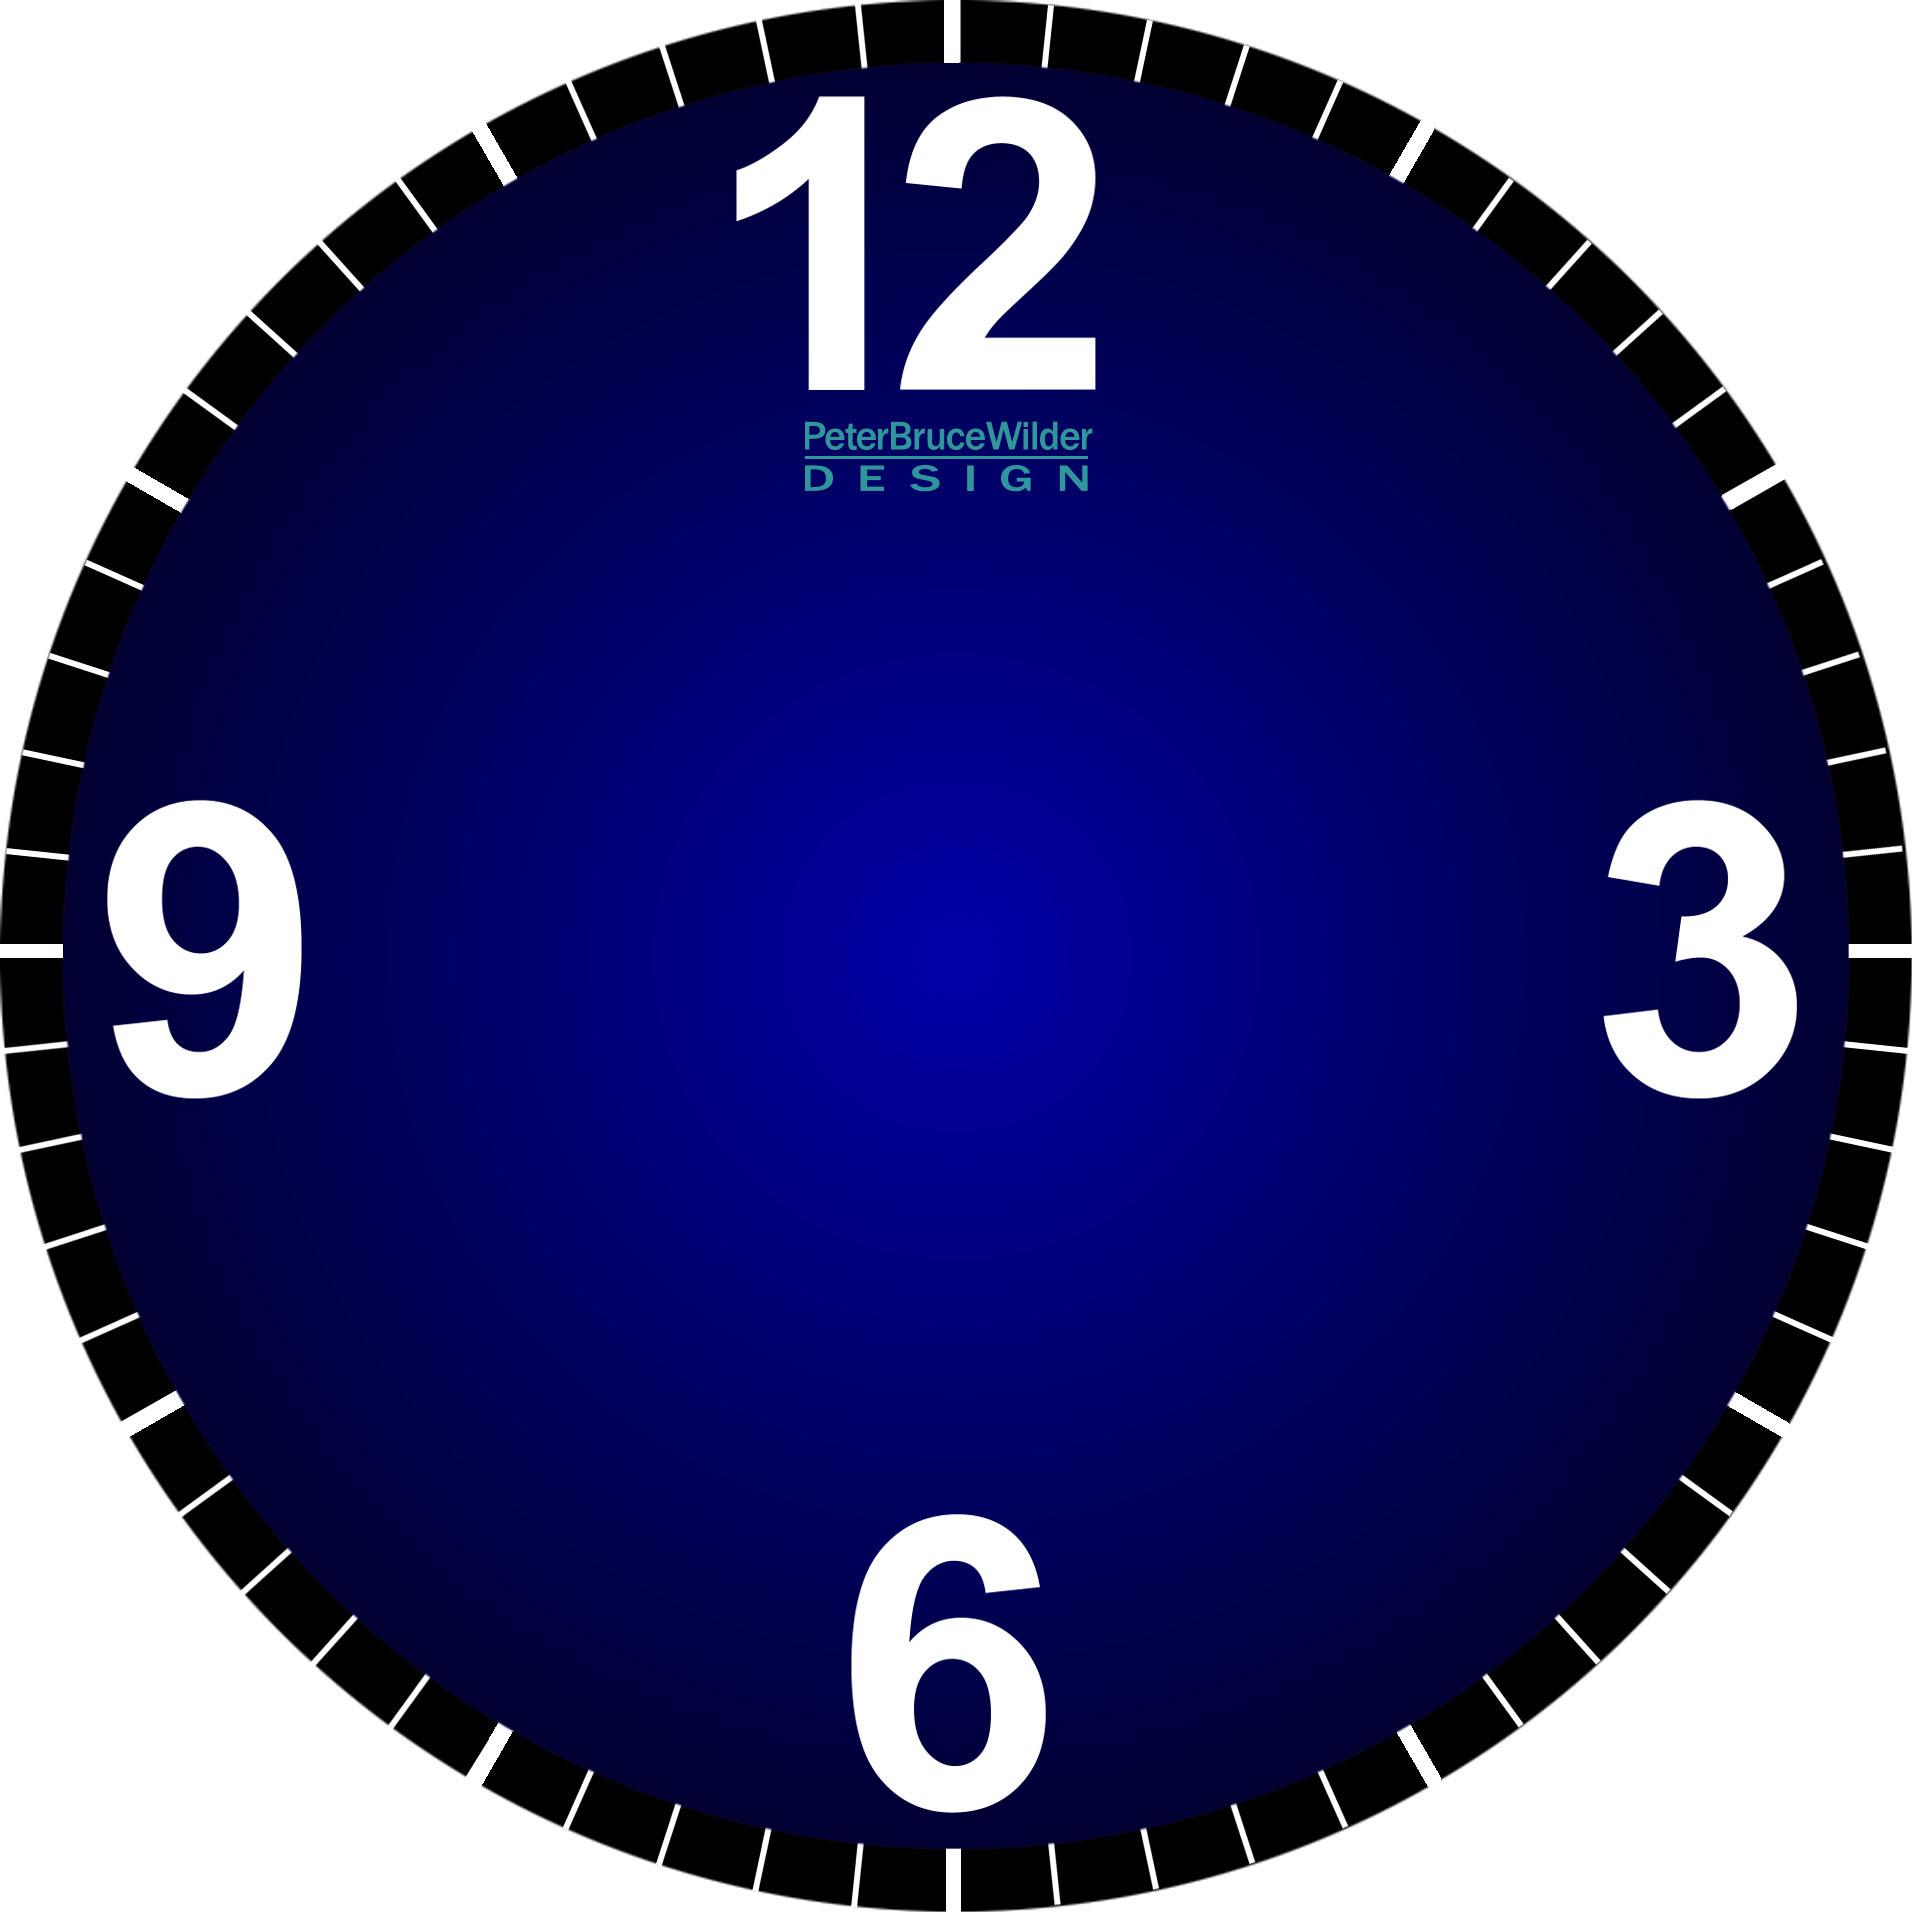 Clock Face Clip Art at Clker.com vector clip art online, royalty ...